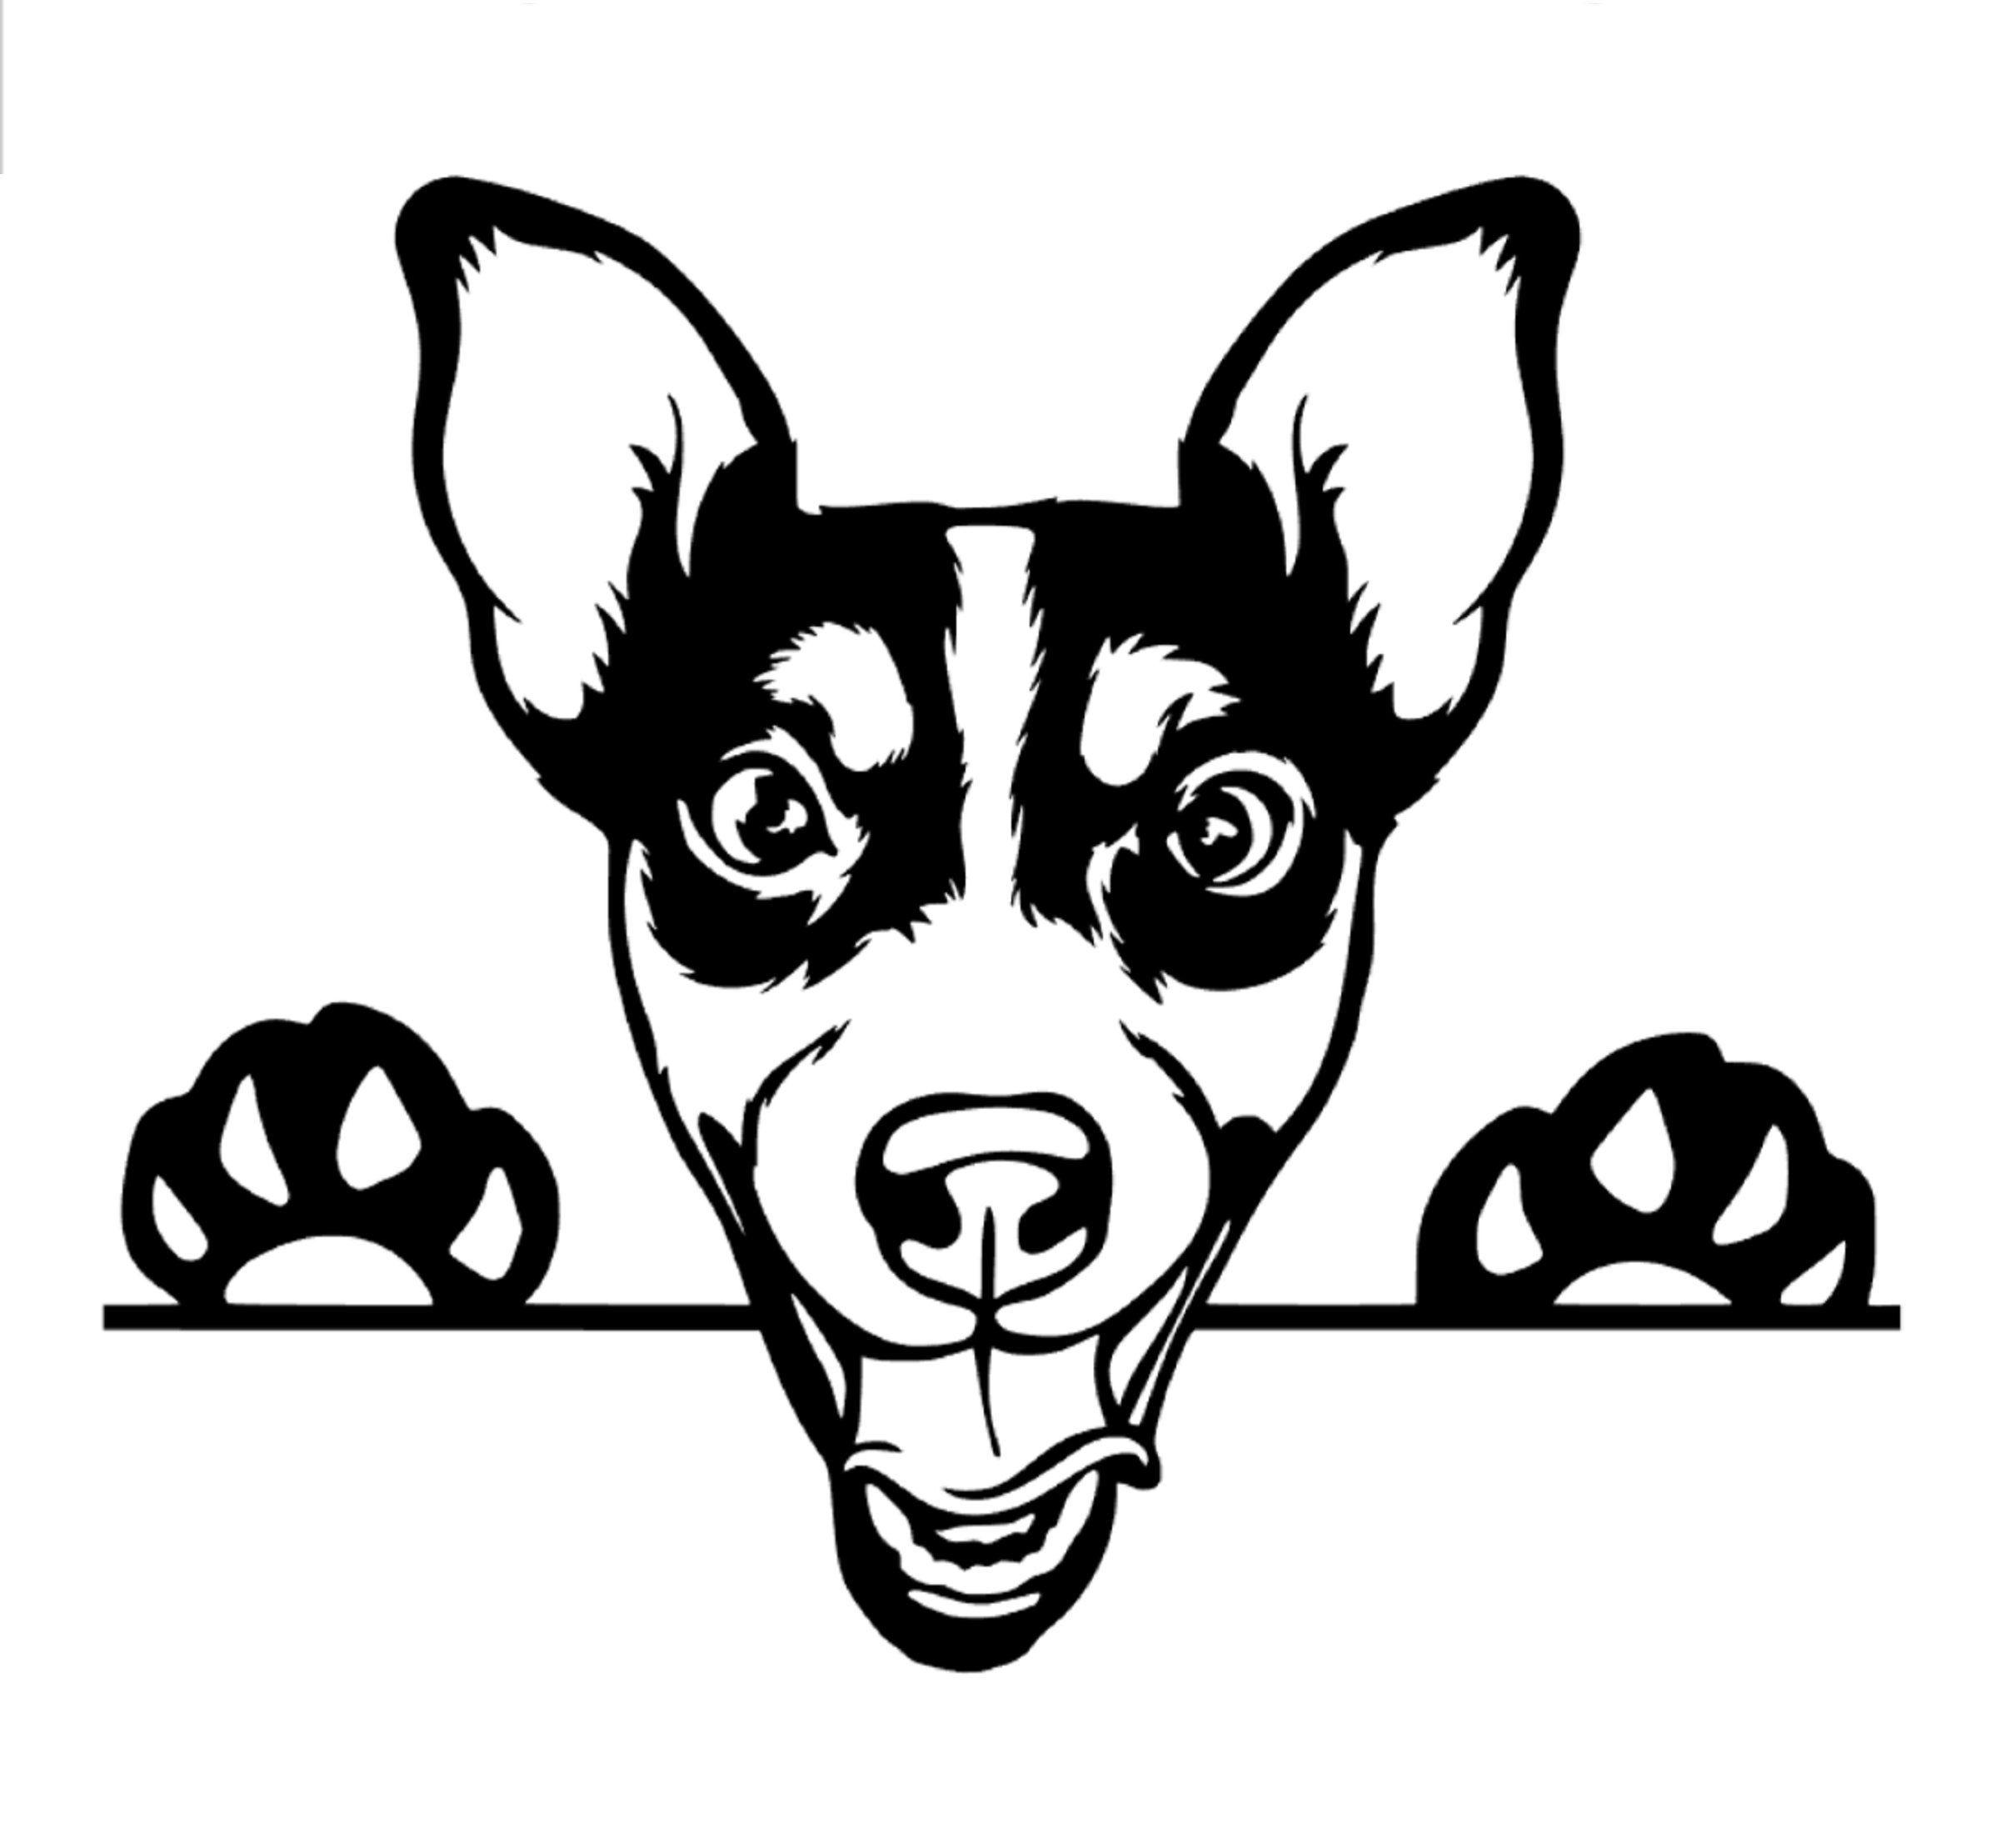 Jack Russell Peeking Car Decal Sticker Jack Russell Terrier Dog Sticker Vinyl Window Cute Jrt Gifts Jack Russell Lover Jack Russell Dog Jack Russell Dog Stickers Jack Russell Dogs [ 2212 x 2420 Pixel ]